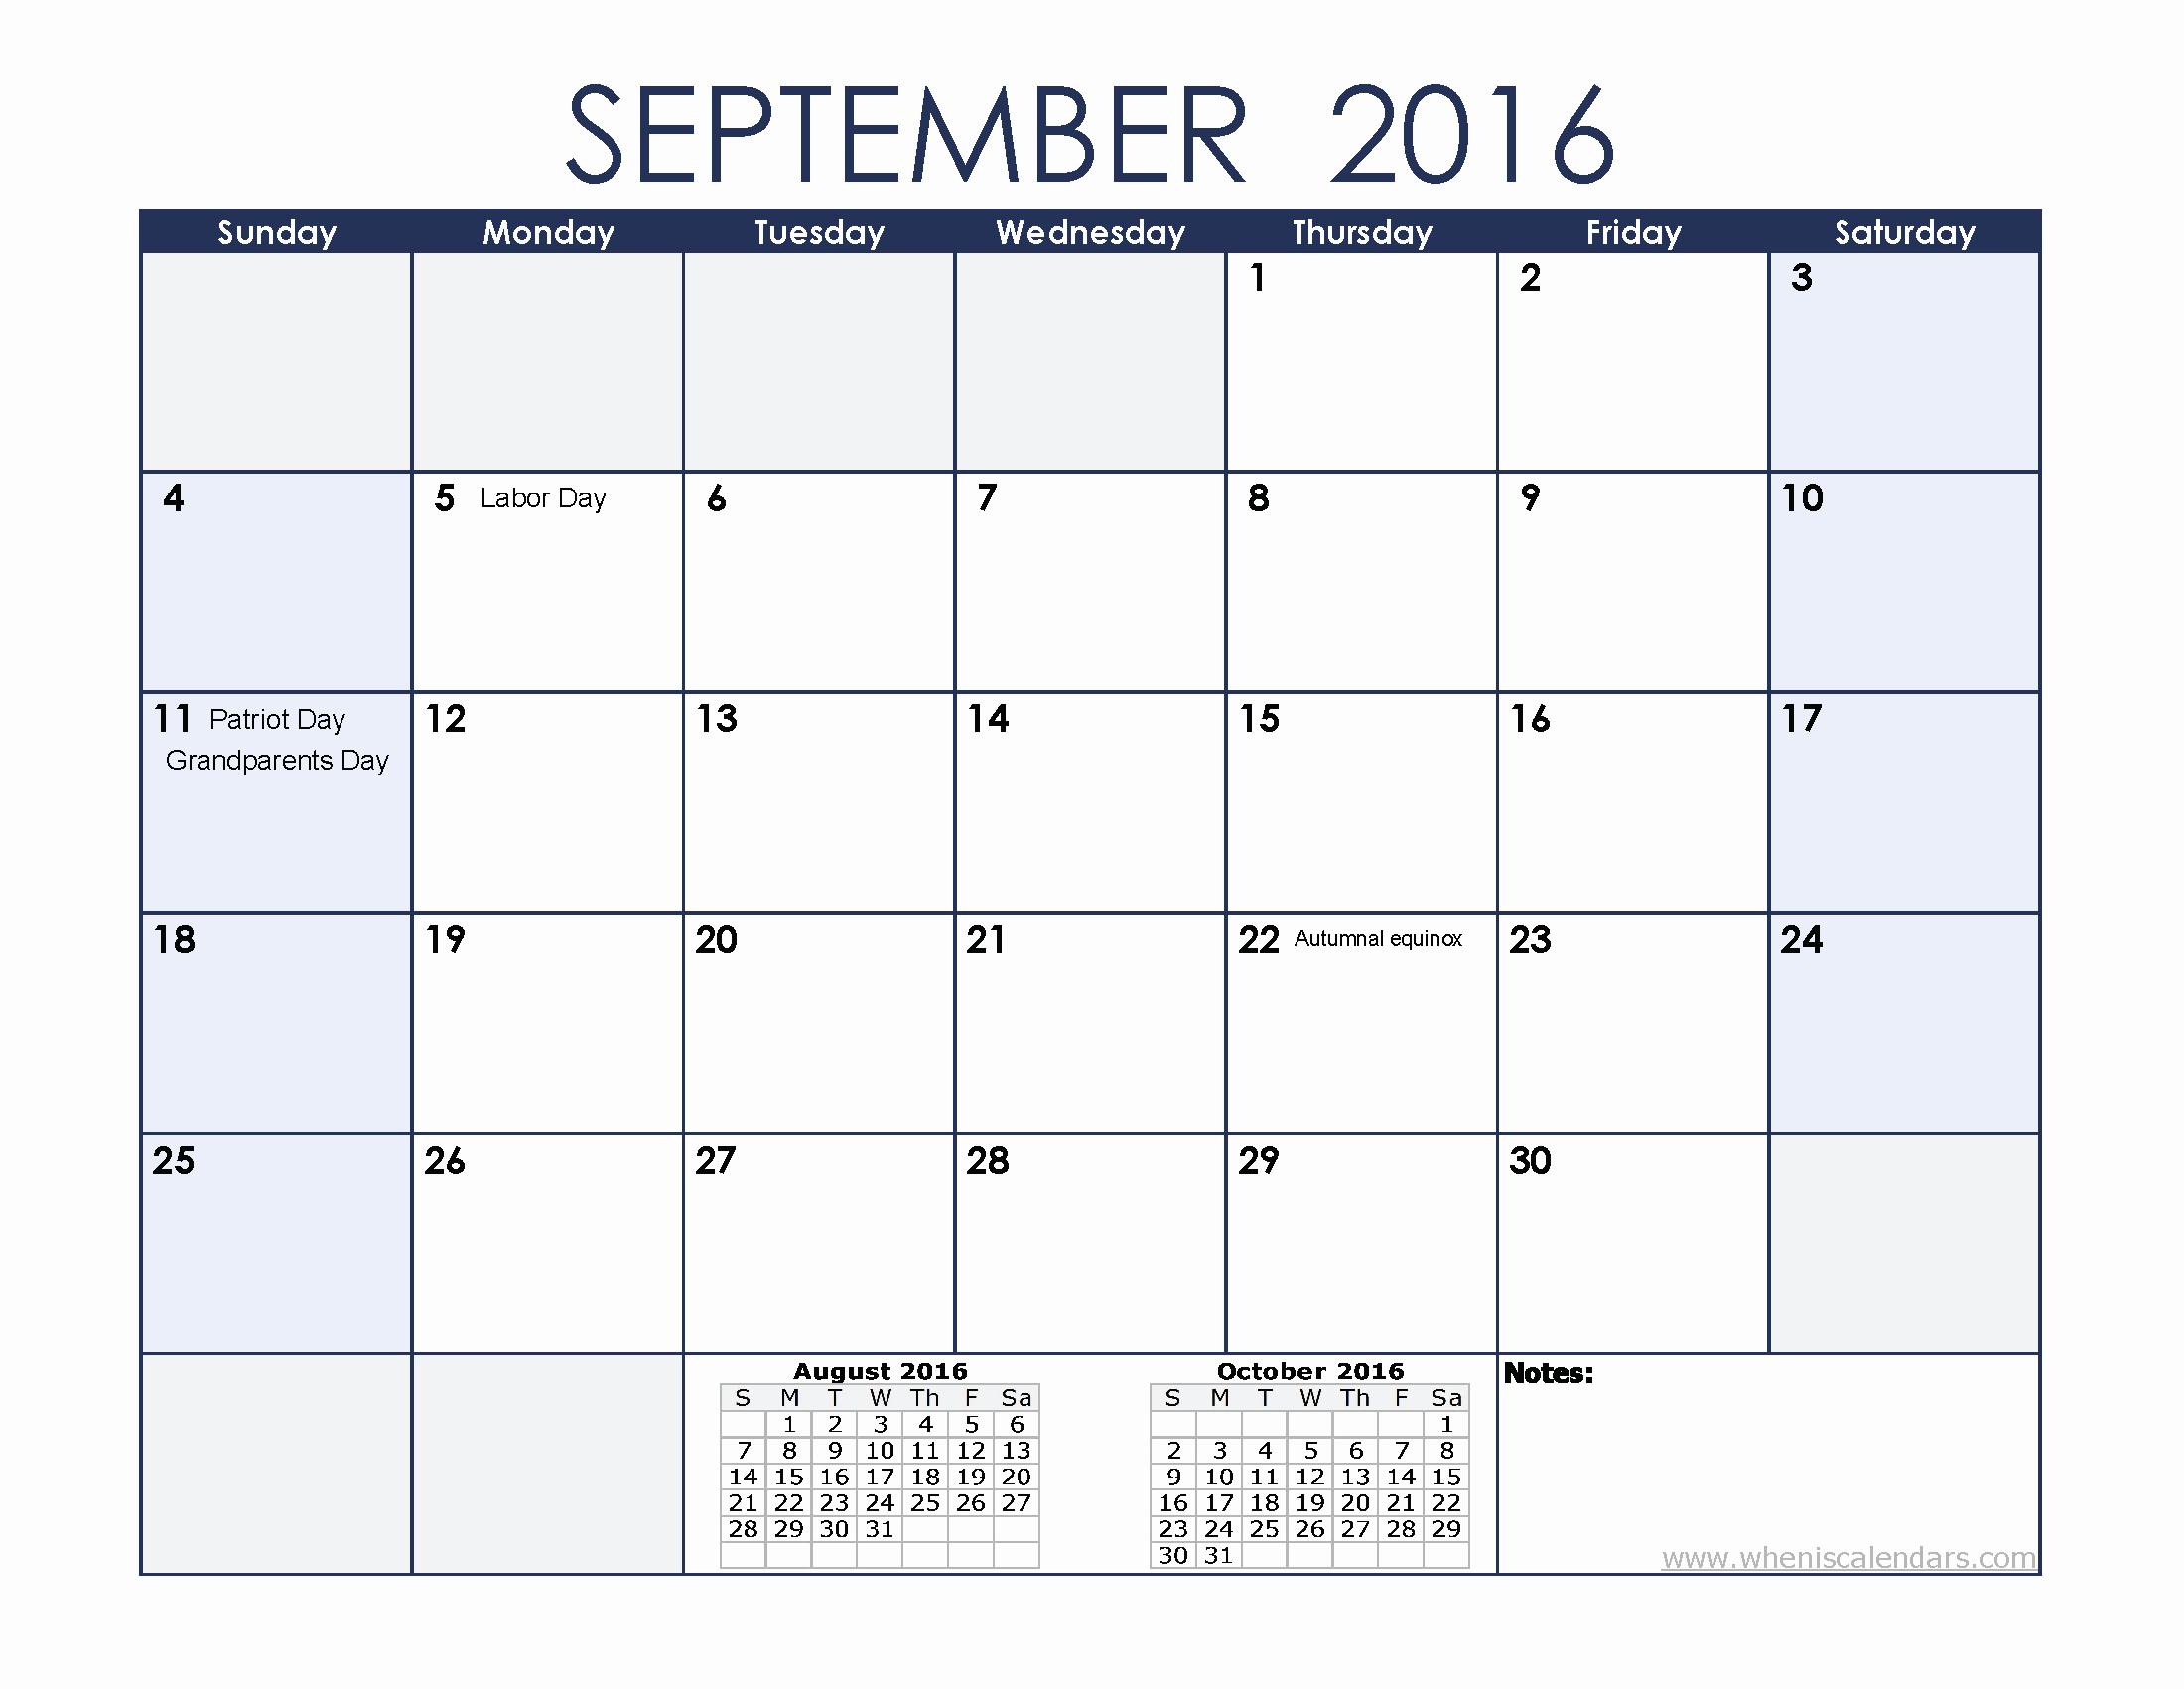 Calendar 2015 Printable with Holidays Fresh Free 2015 Printable Calendar Template with Holidays